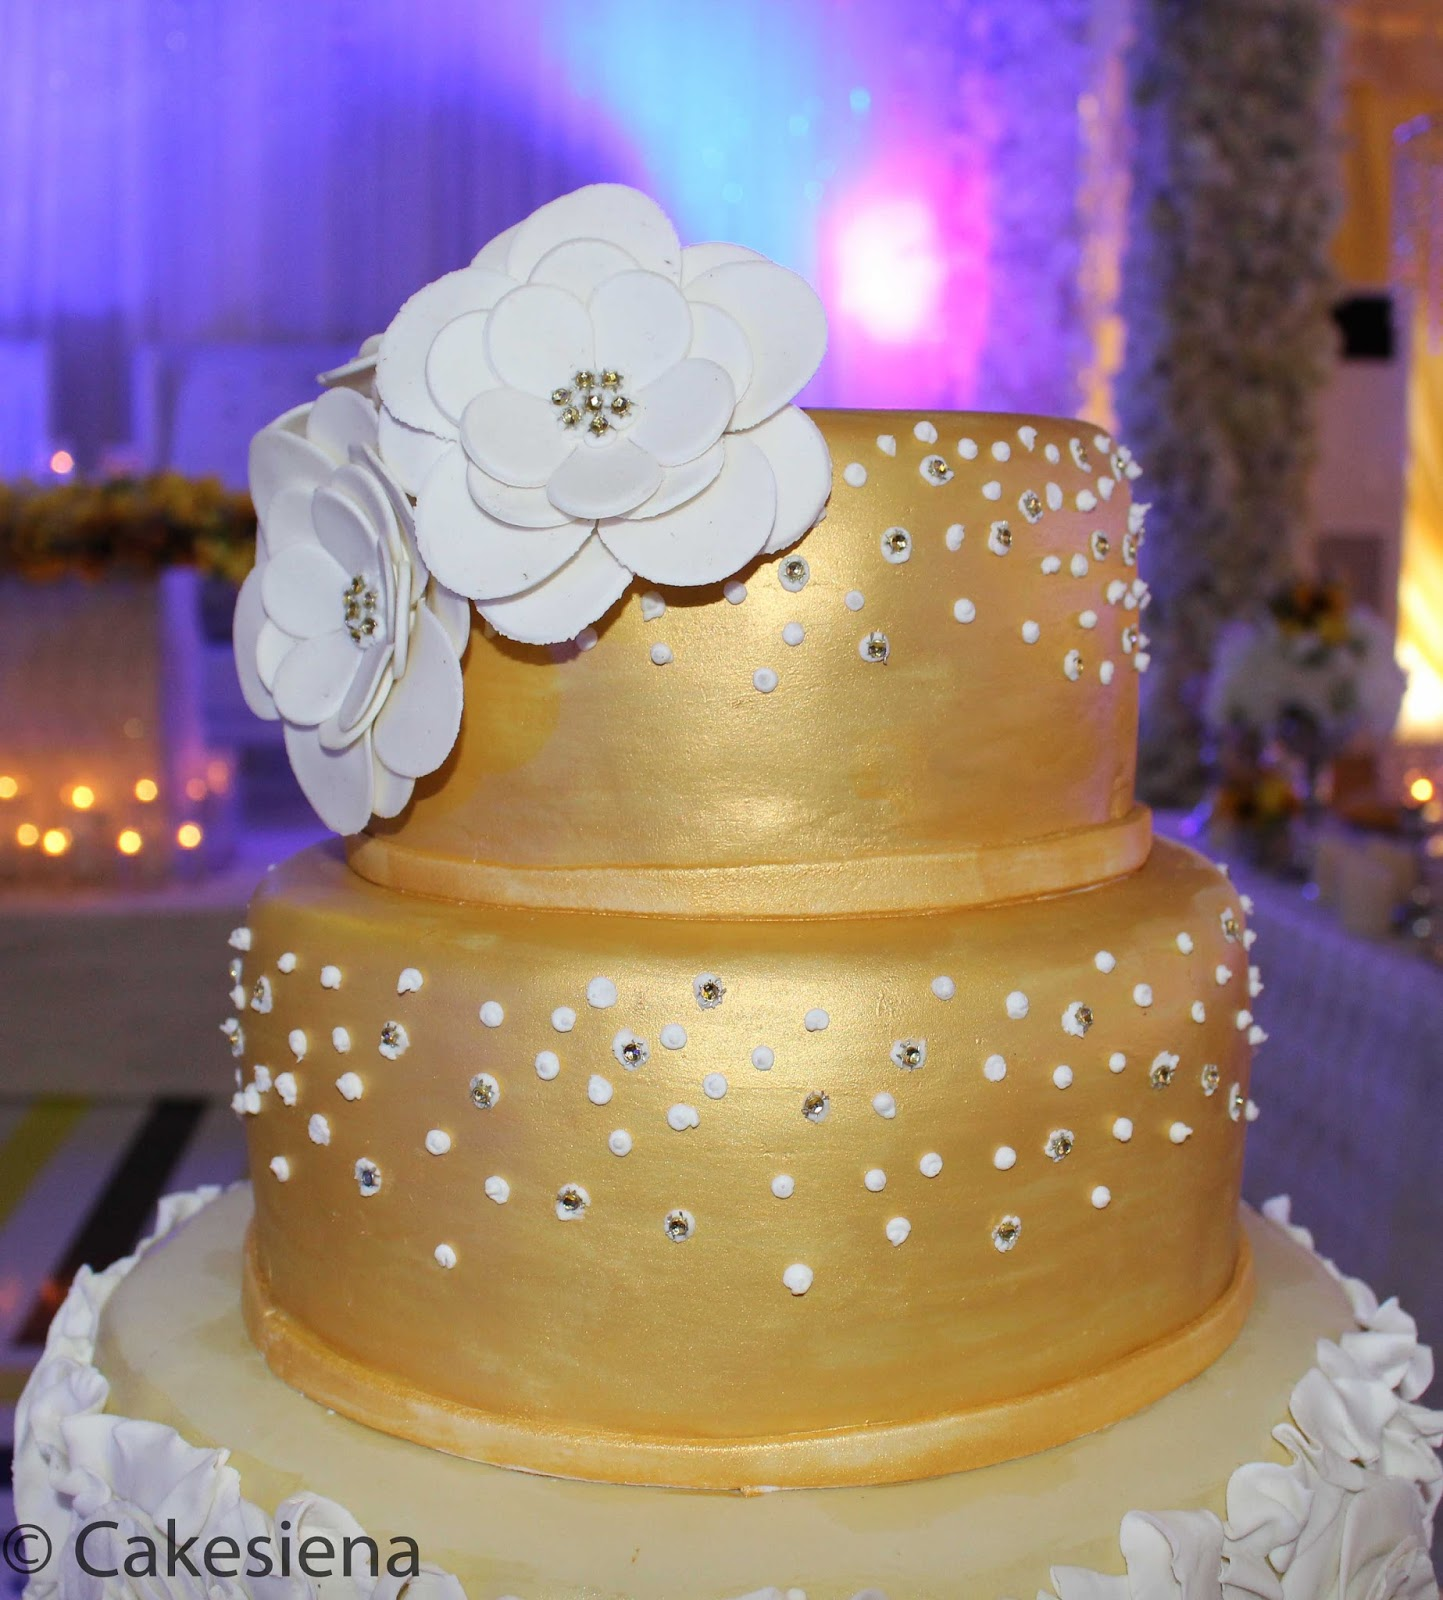 Cake Factory: White and Gold Wedding Cake